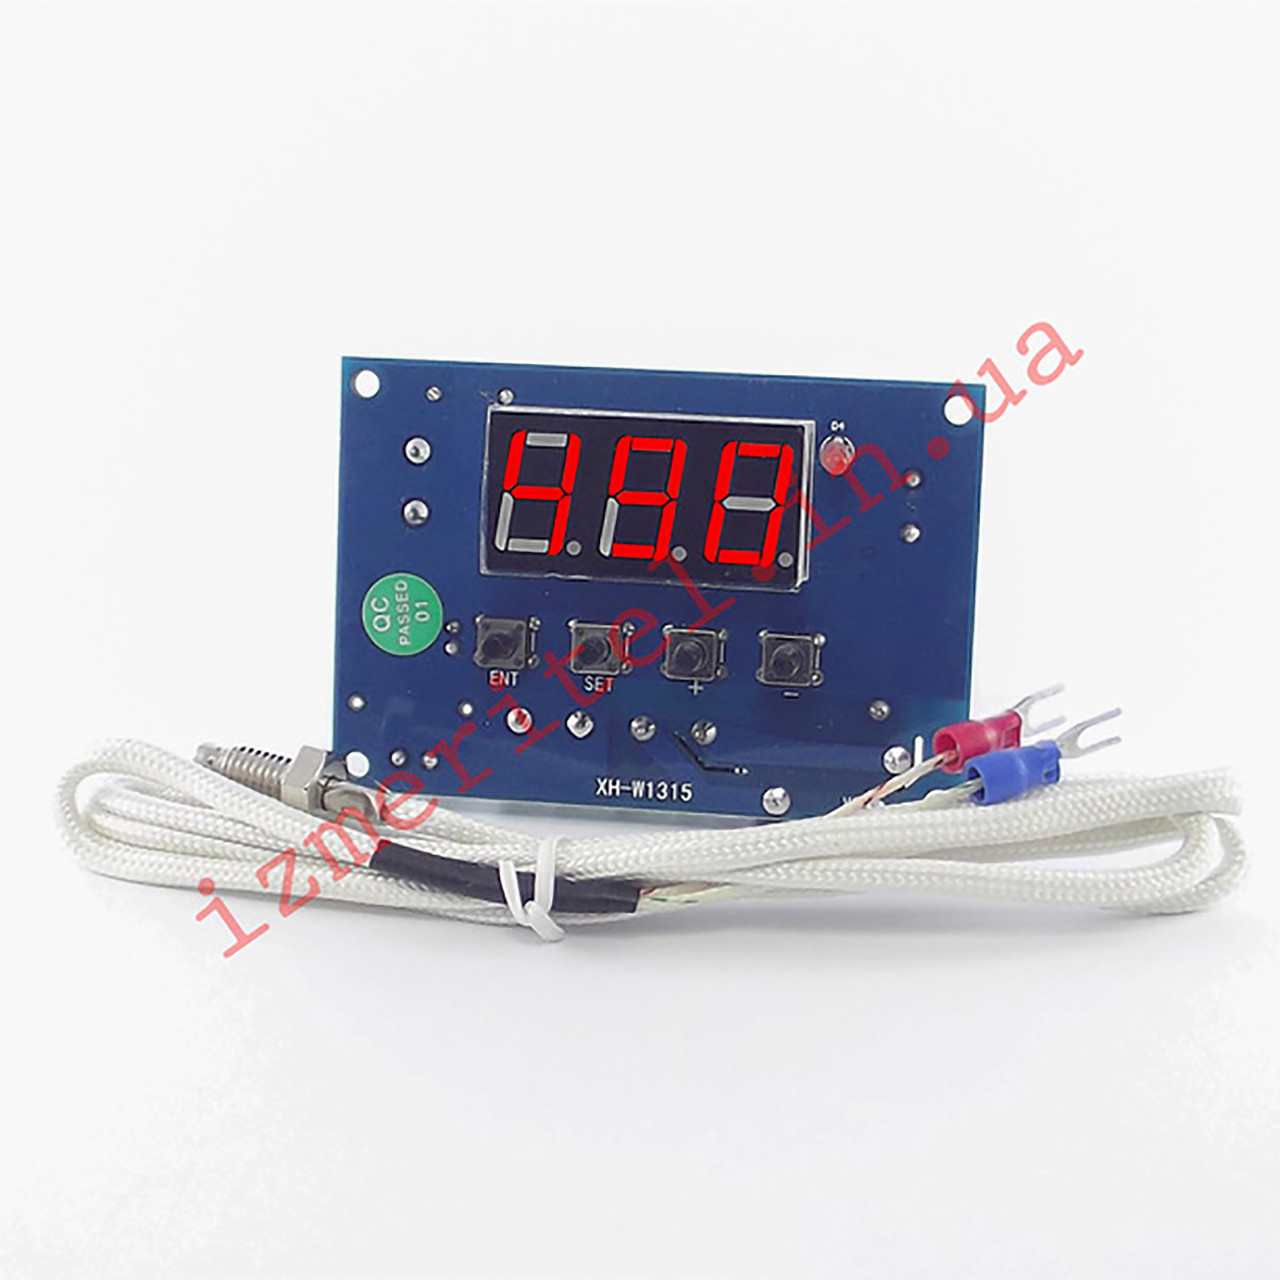 Высокотемпературный терморегулятор W1315 12v